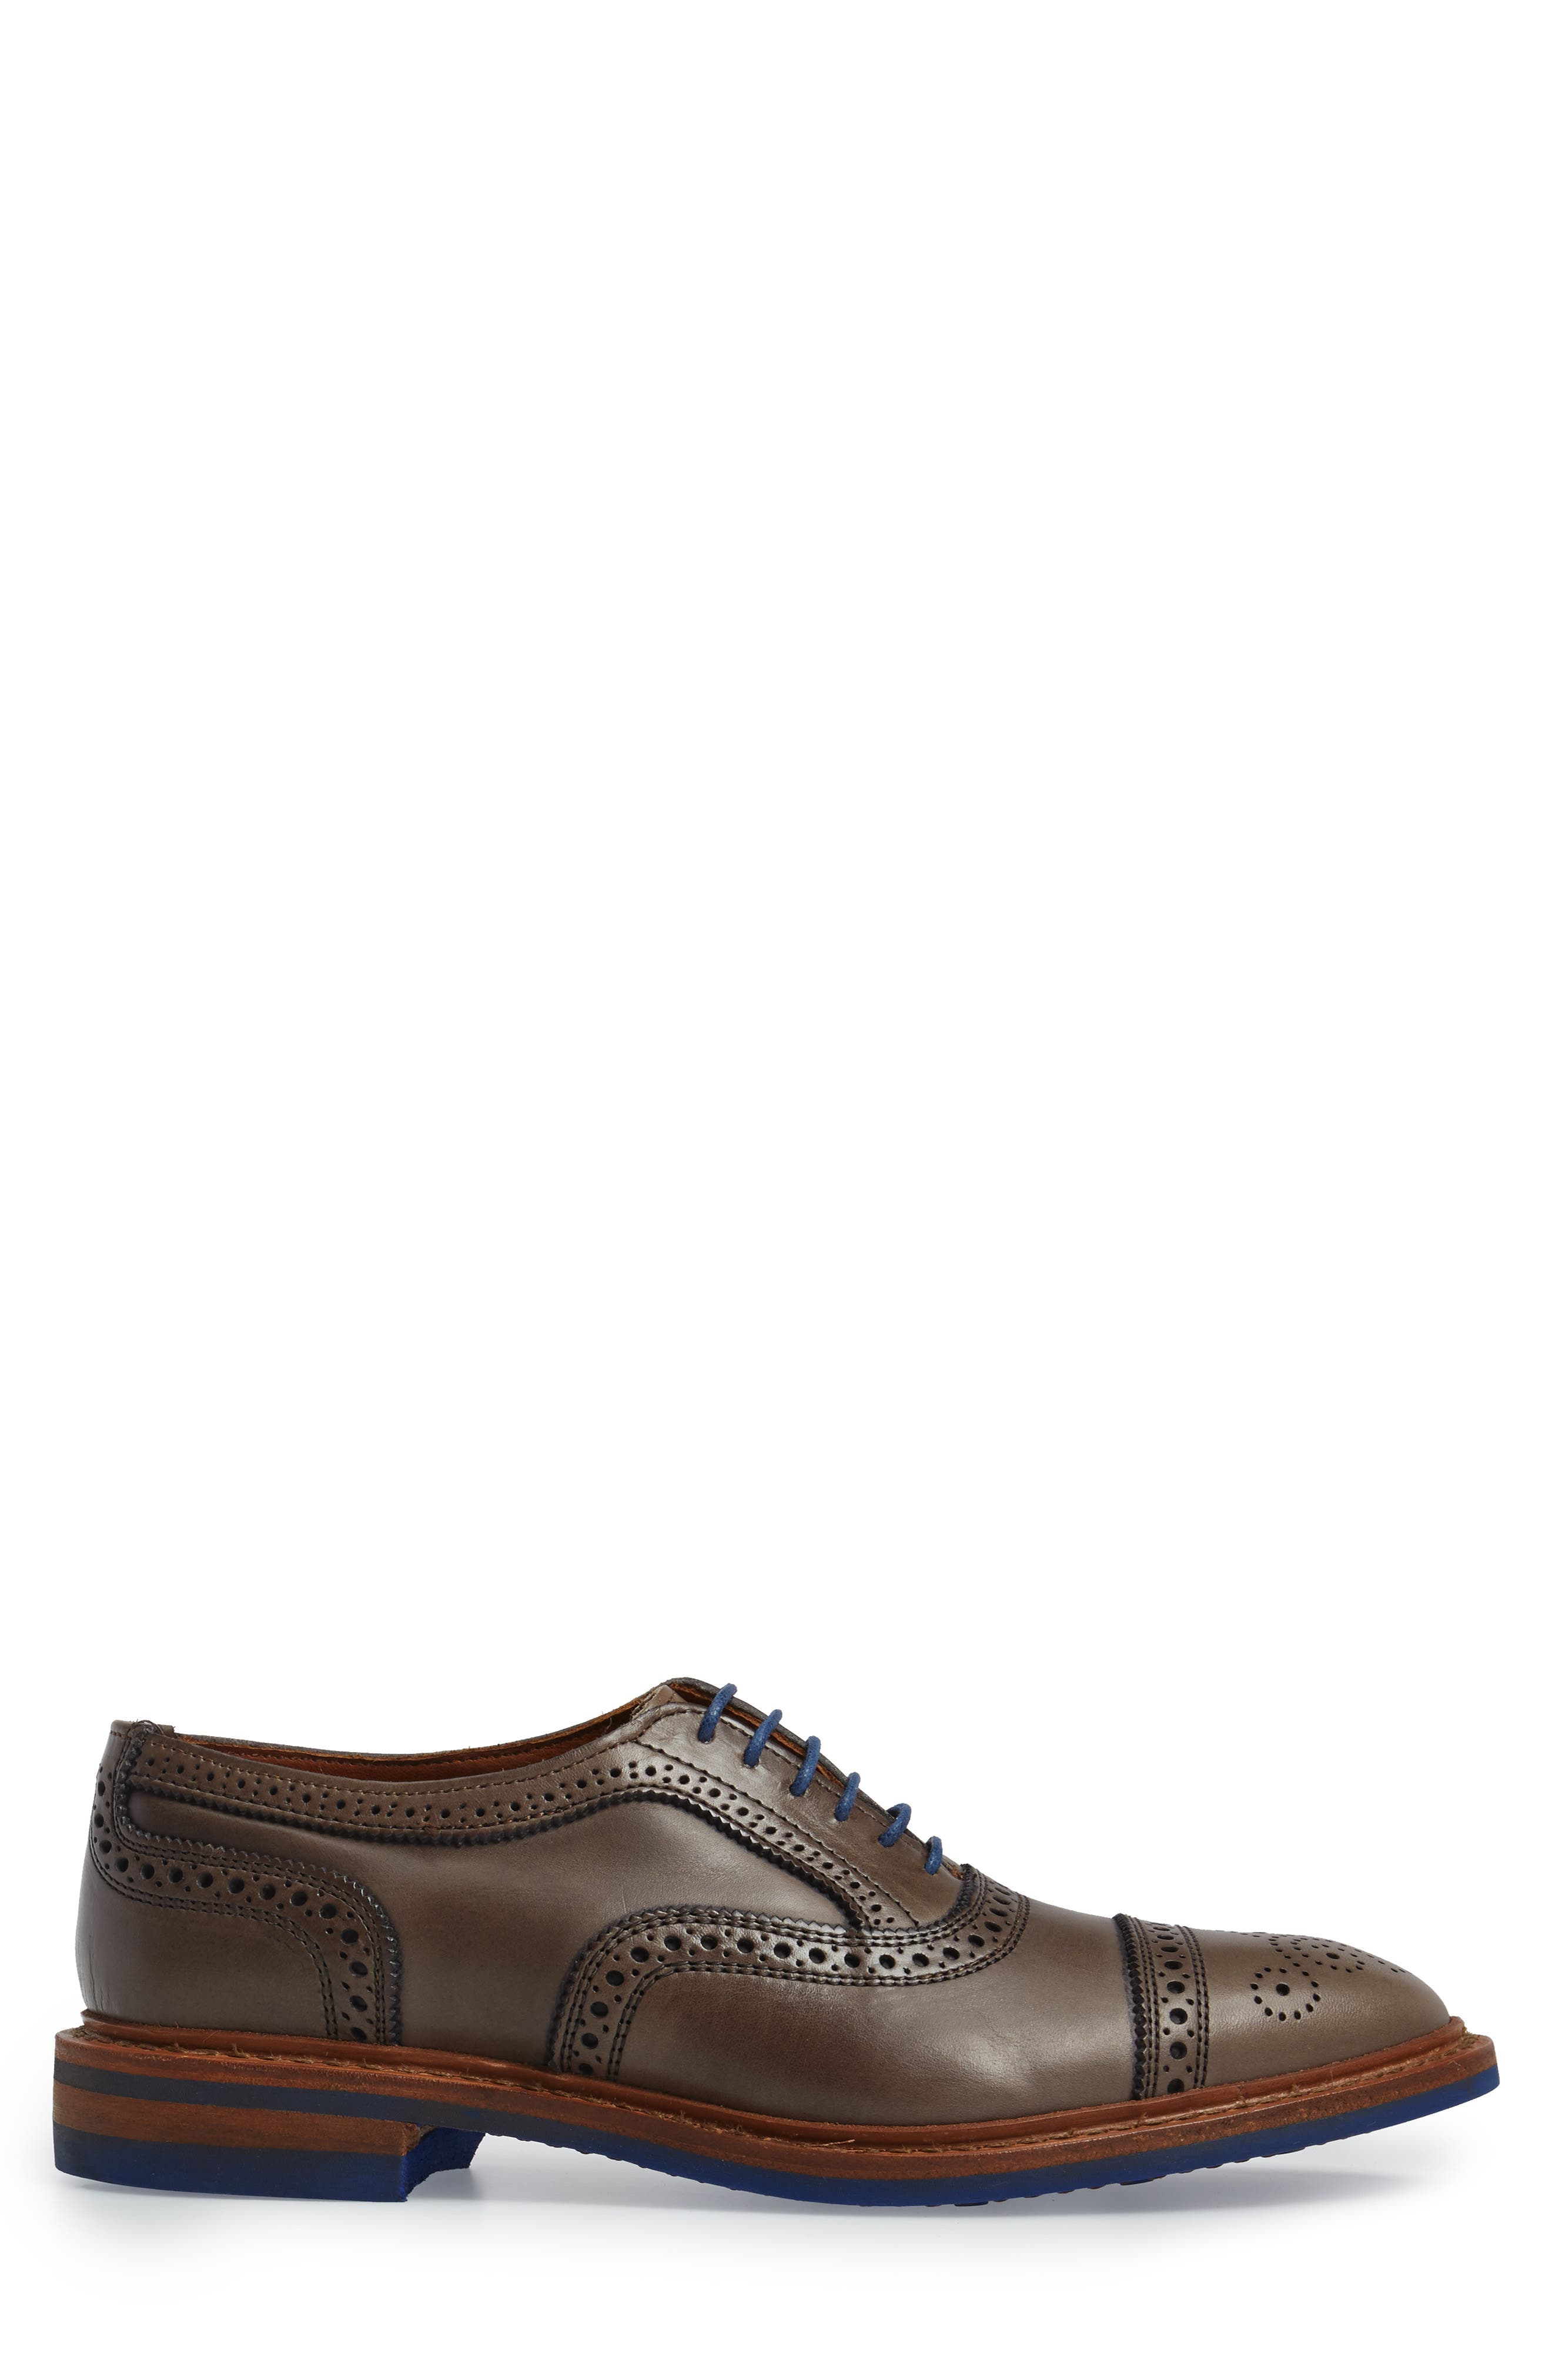 'Strandmok' Cap Toe Oxford,                             Alternate thumbnail 3, color,                             Grey Leather